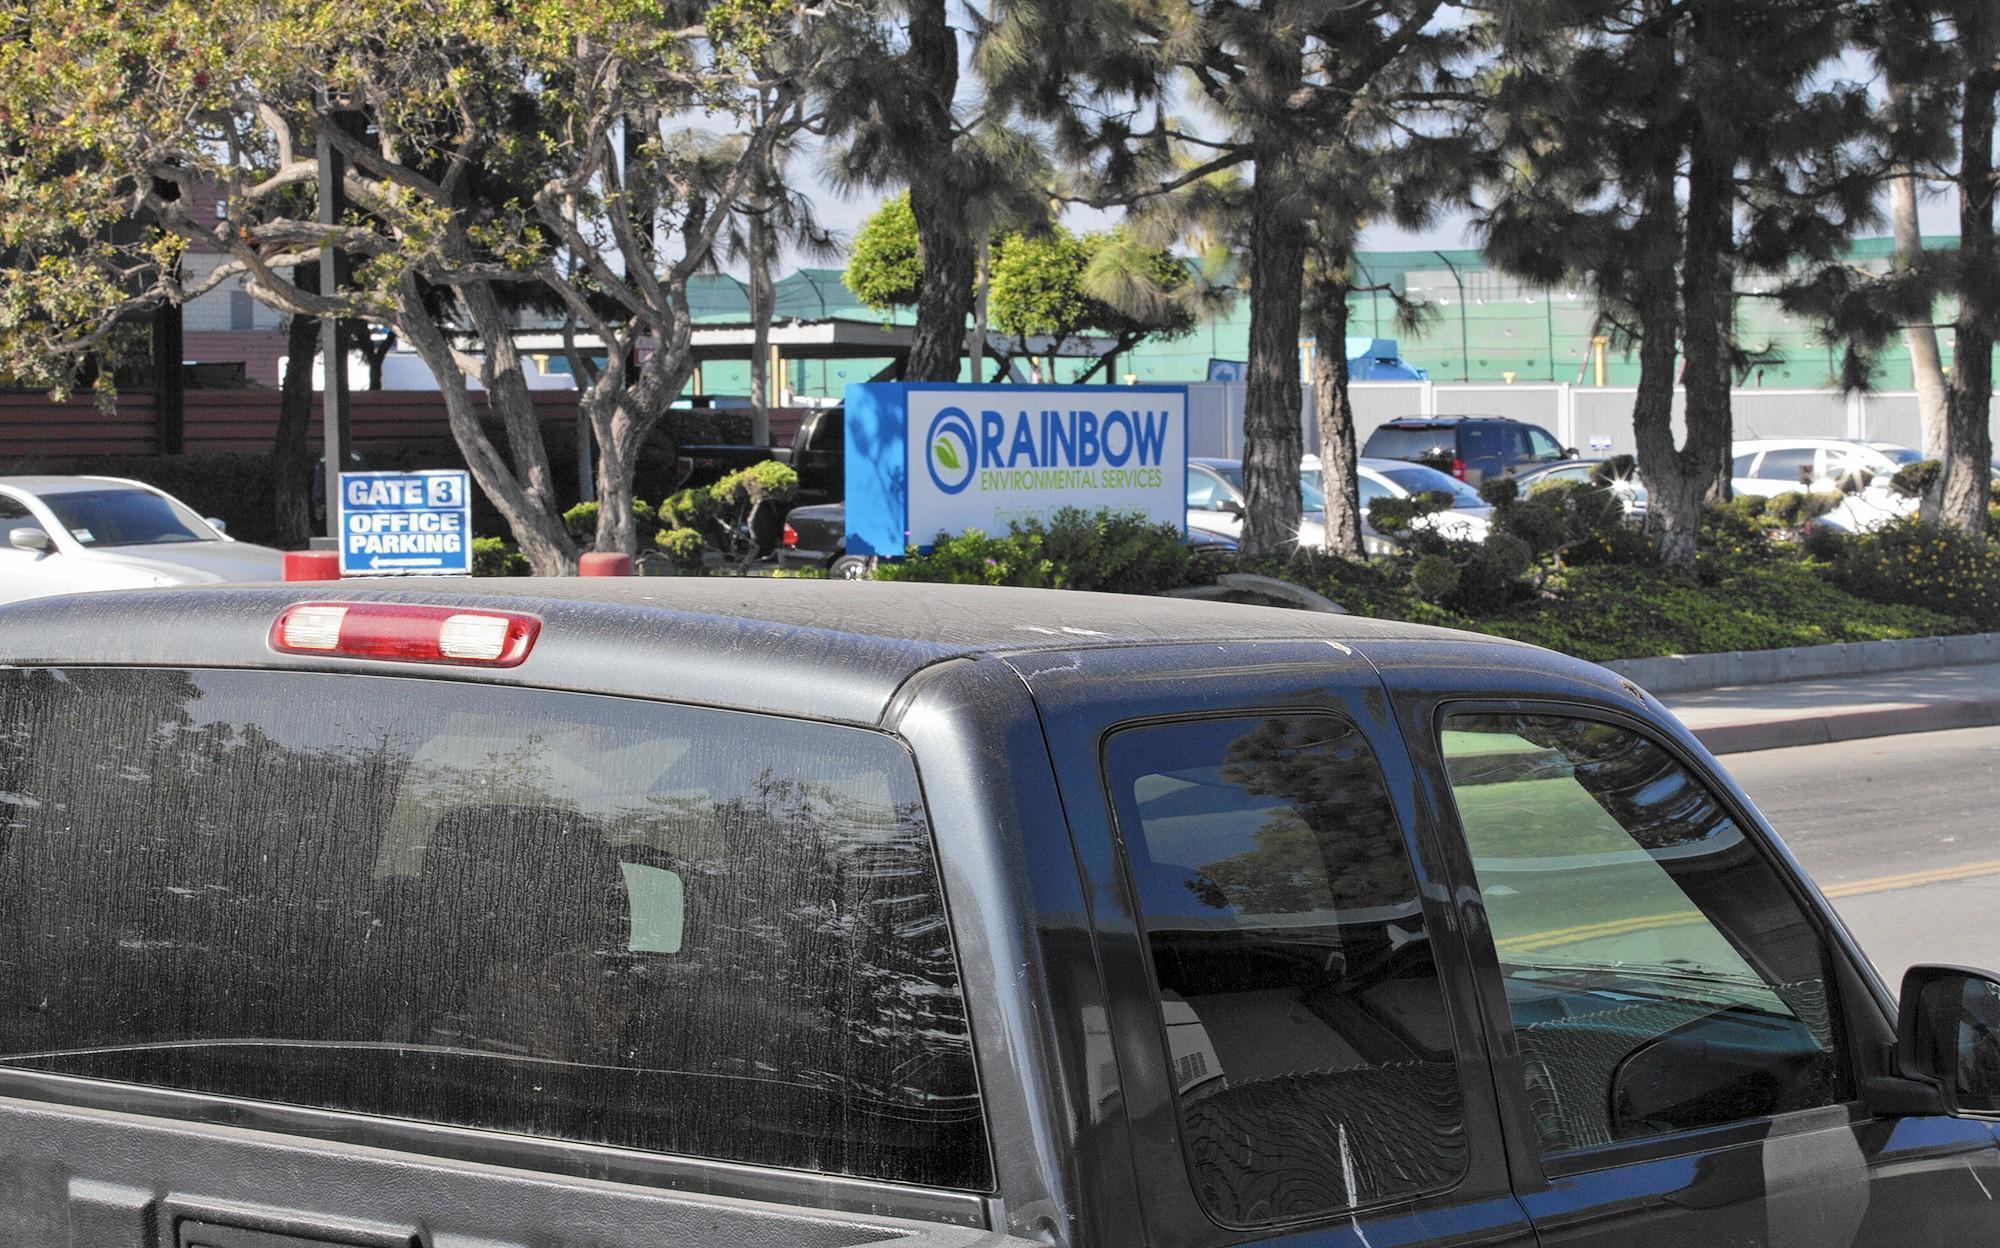 oak view preschool rainbow pledges 22m for improvements in settlement of 632